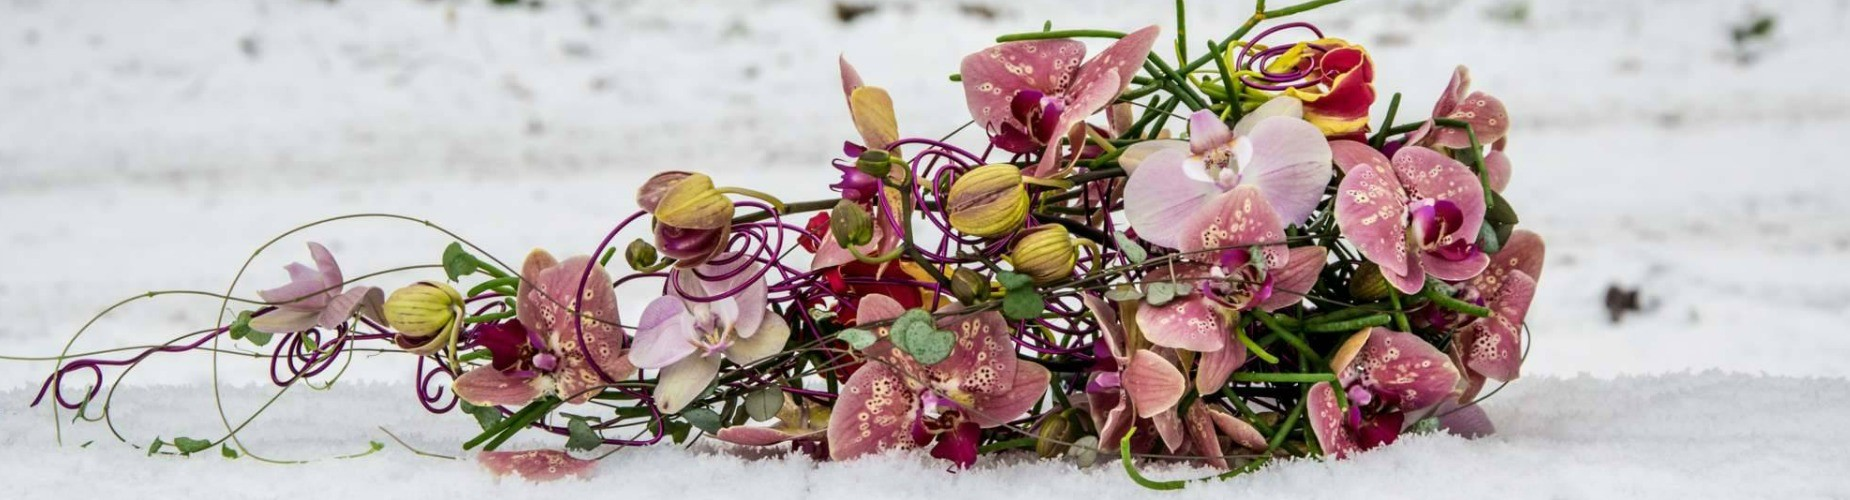 bruidsboeket-borger-bruidsbloemen-orchidee-winterwedding-wedding-bruiloft-drenthe